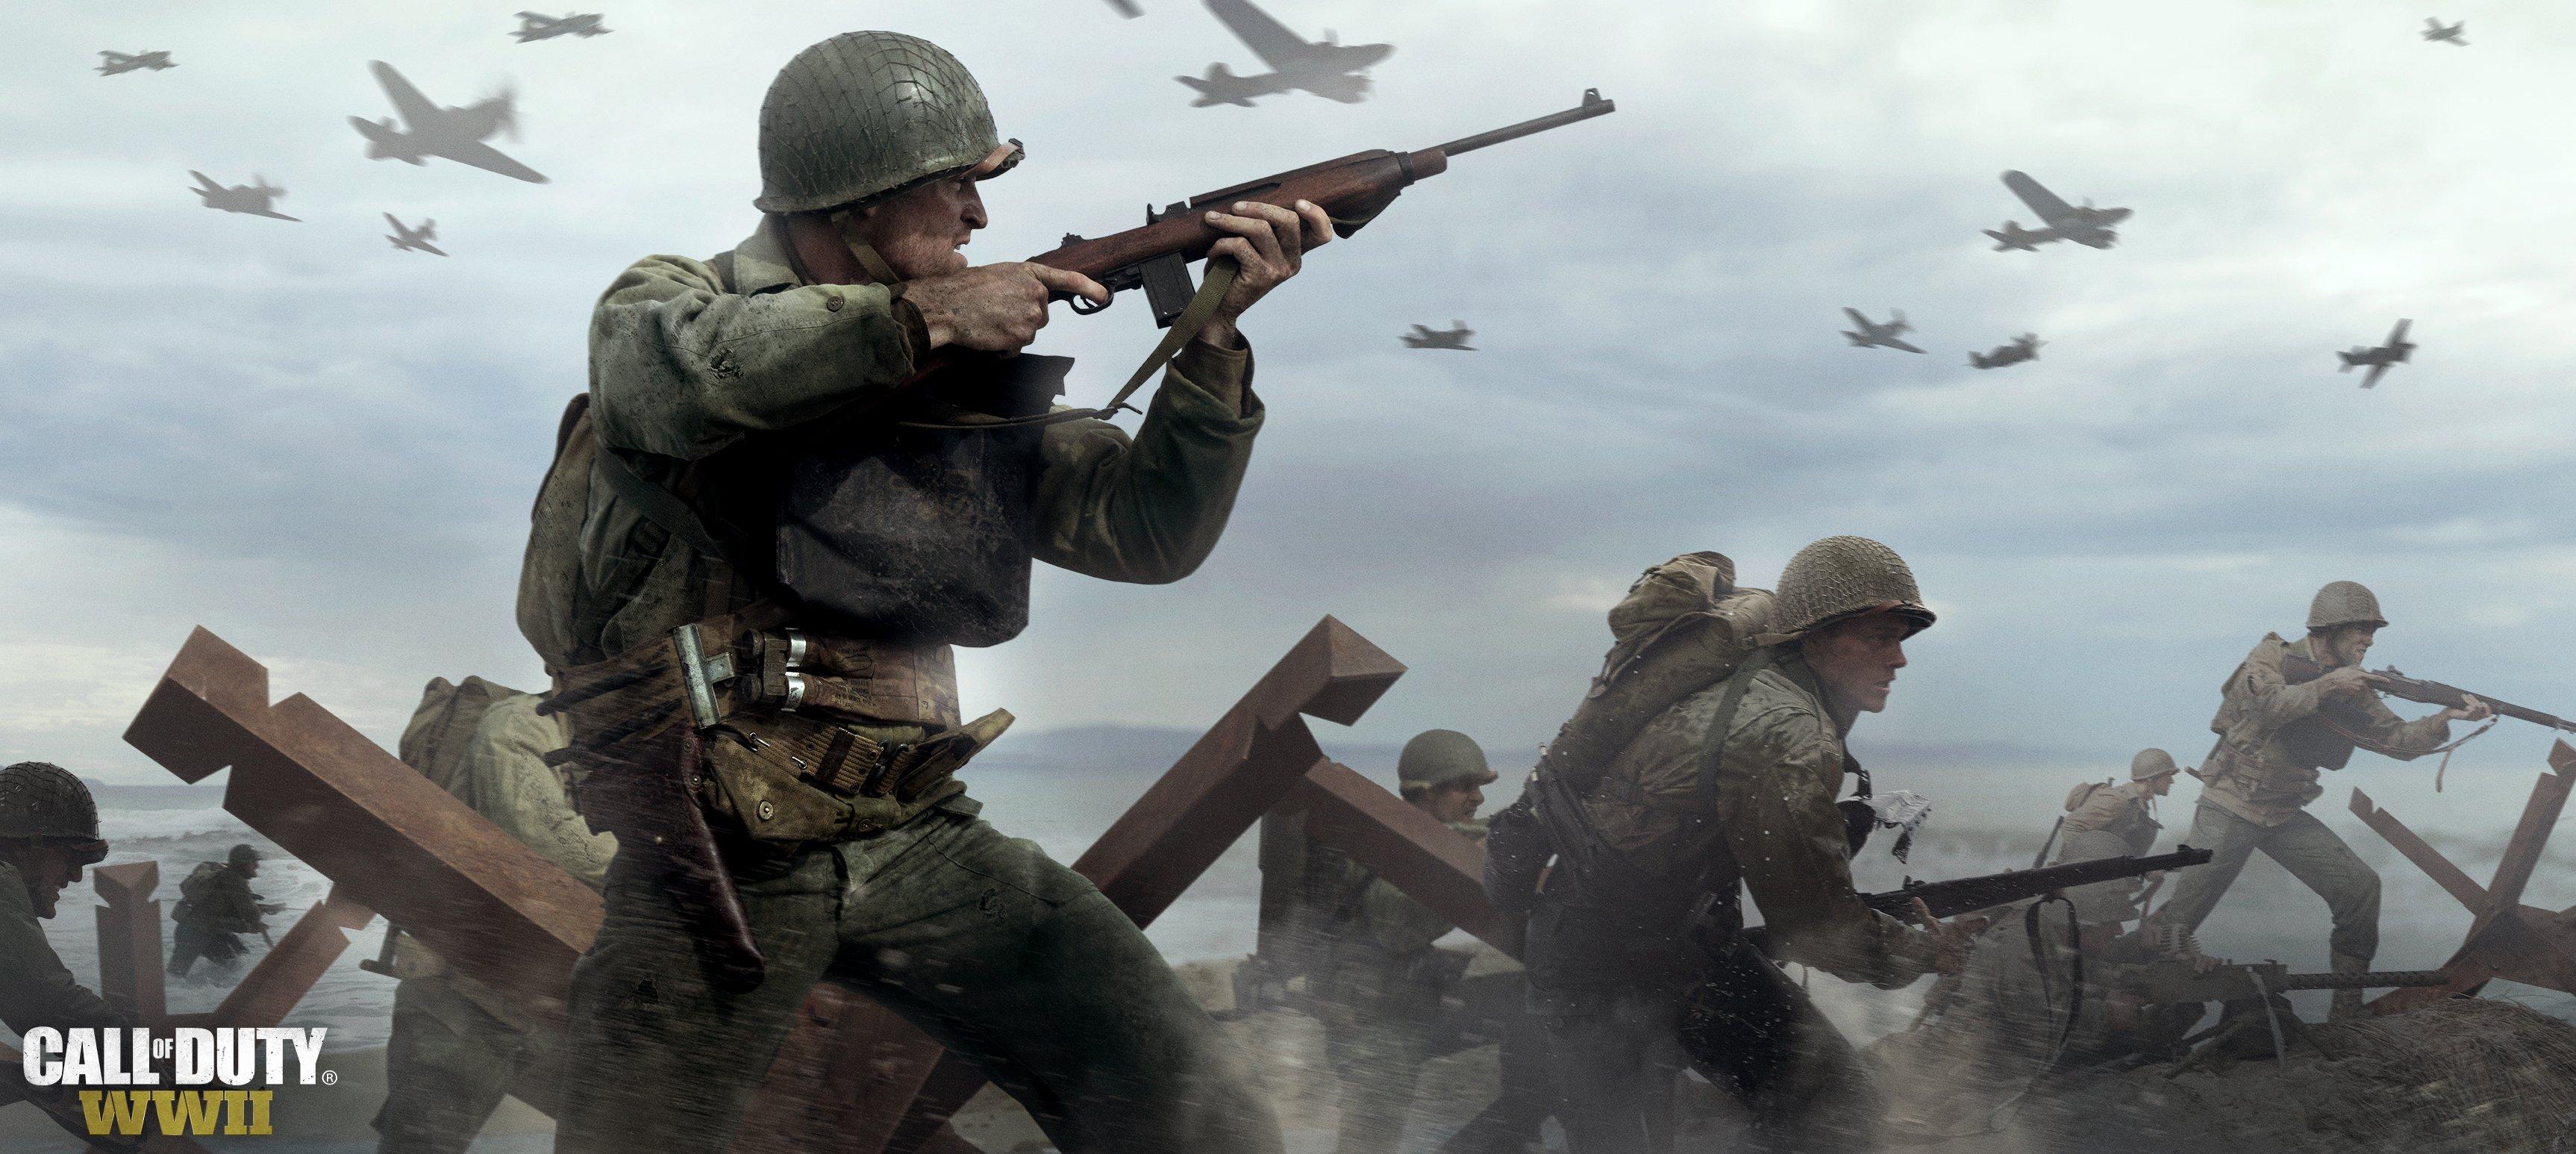 Fondos de pantalla Call Of Duty WW2